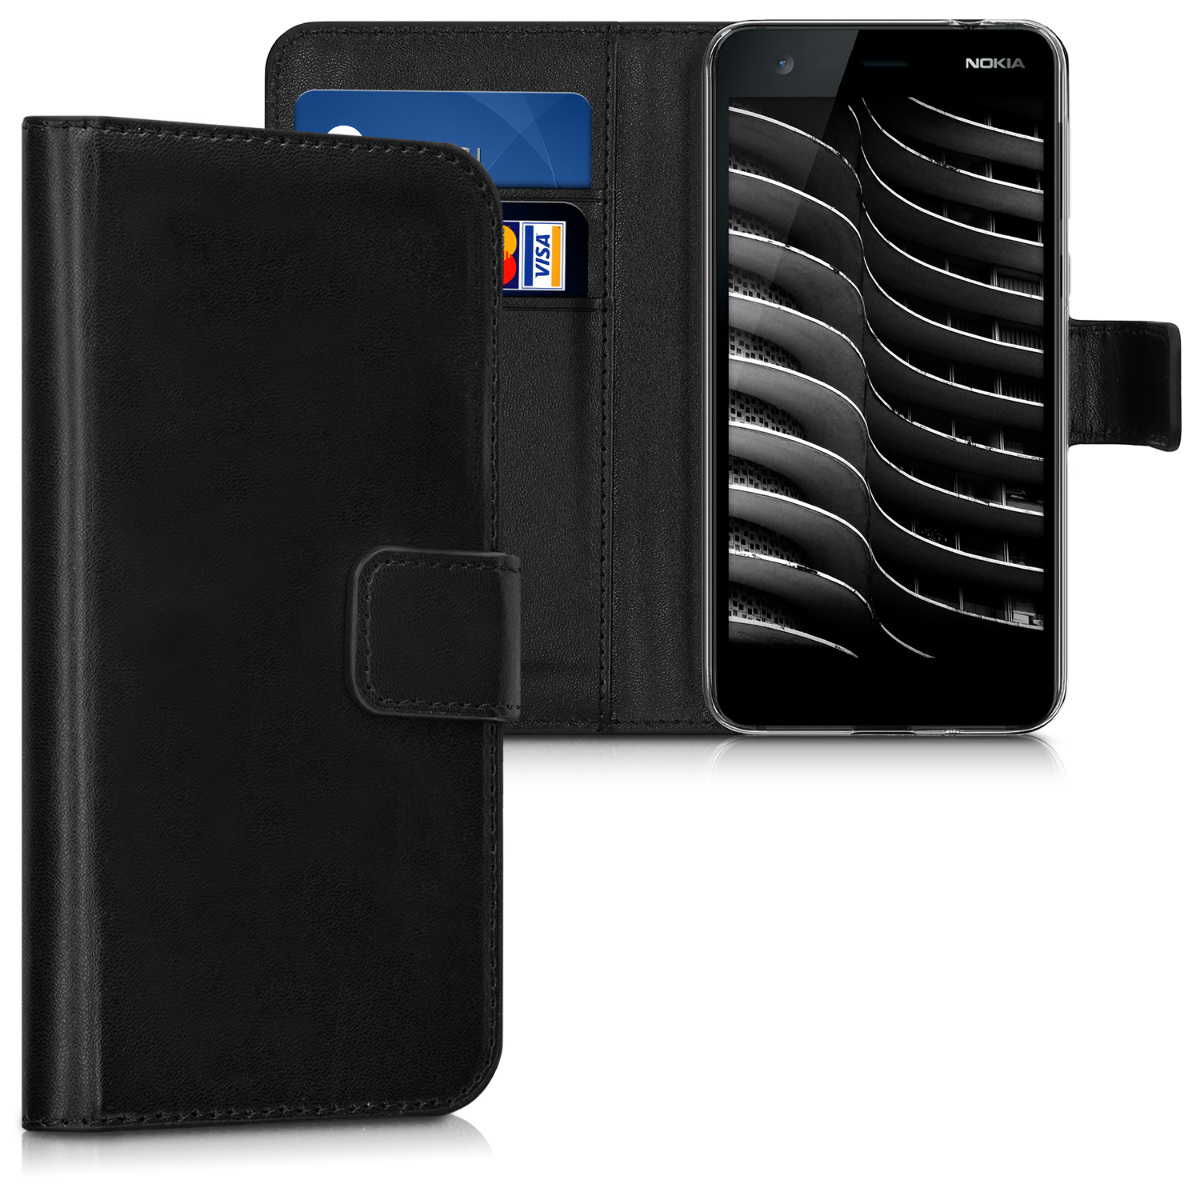 KW Θήκη Πορτοφόλι Nokia 2 - Black (43303.01)